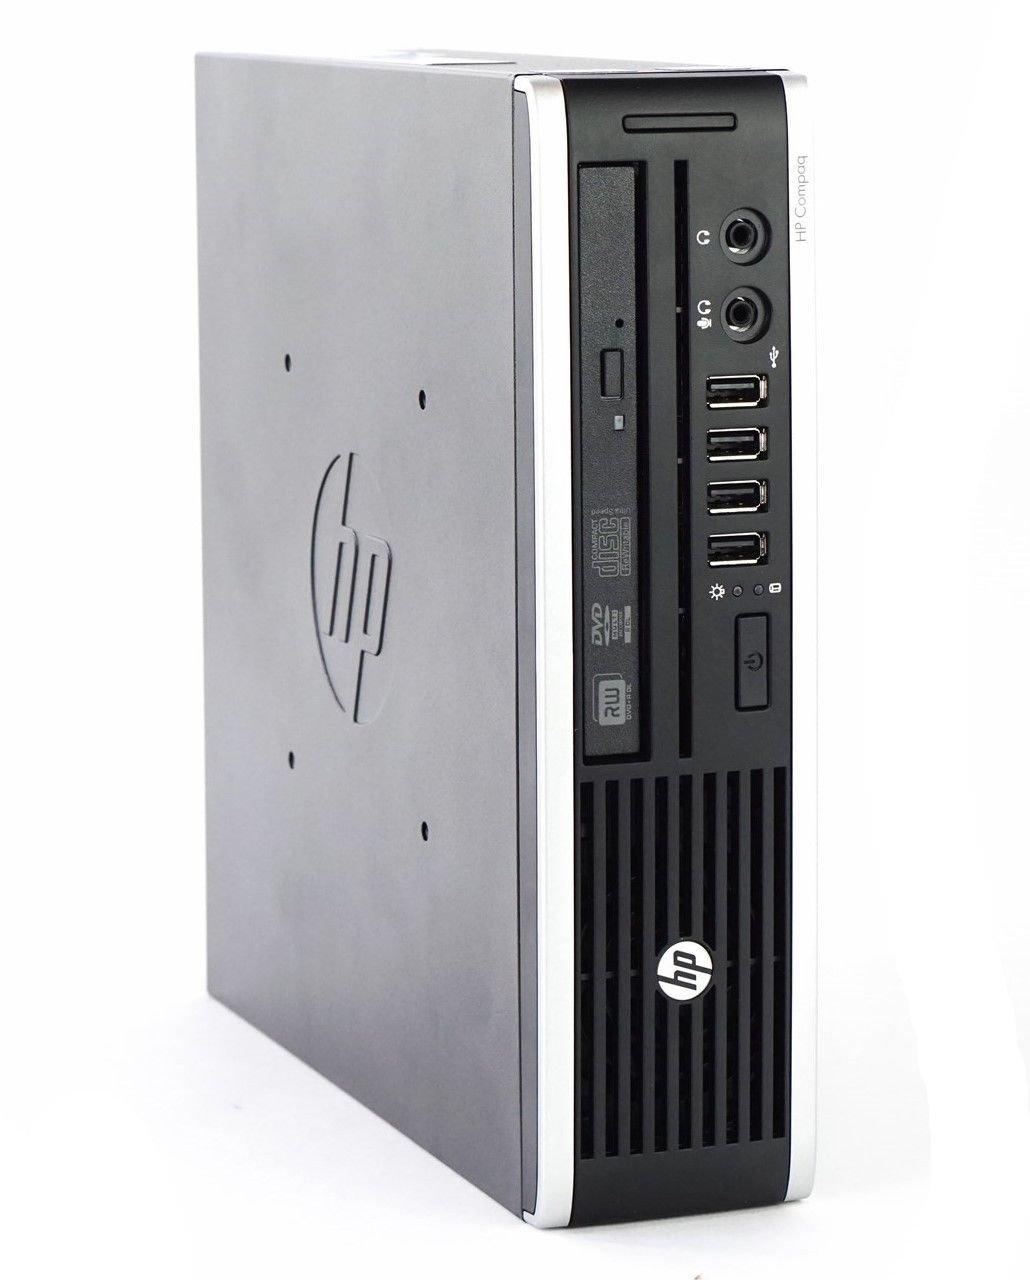 HP Elite 8200 Ultra Slim Desktop PC - Intel Core i5-2400S 2.7GHz 8GB 128GB SSD Windows 10 Professional (Renewed)